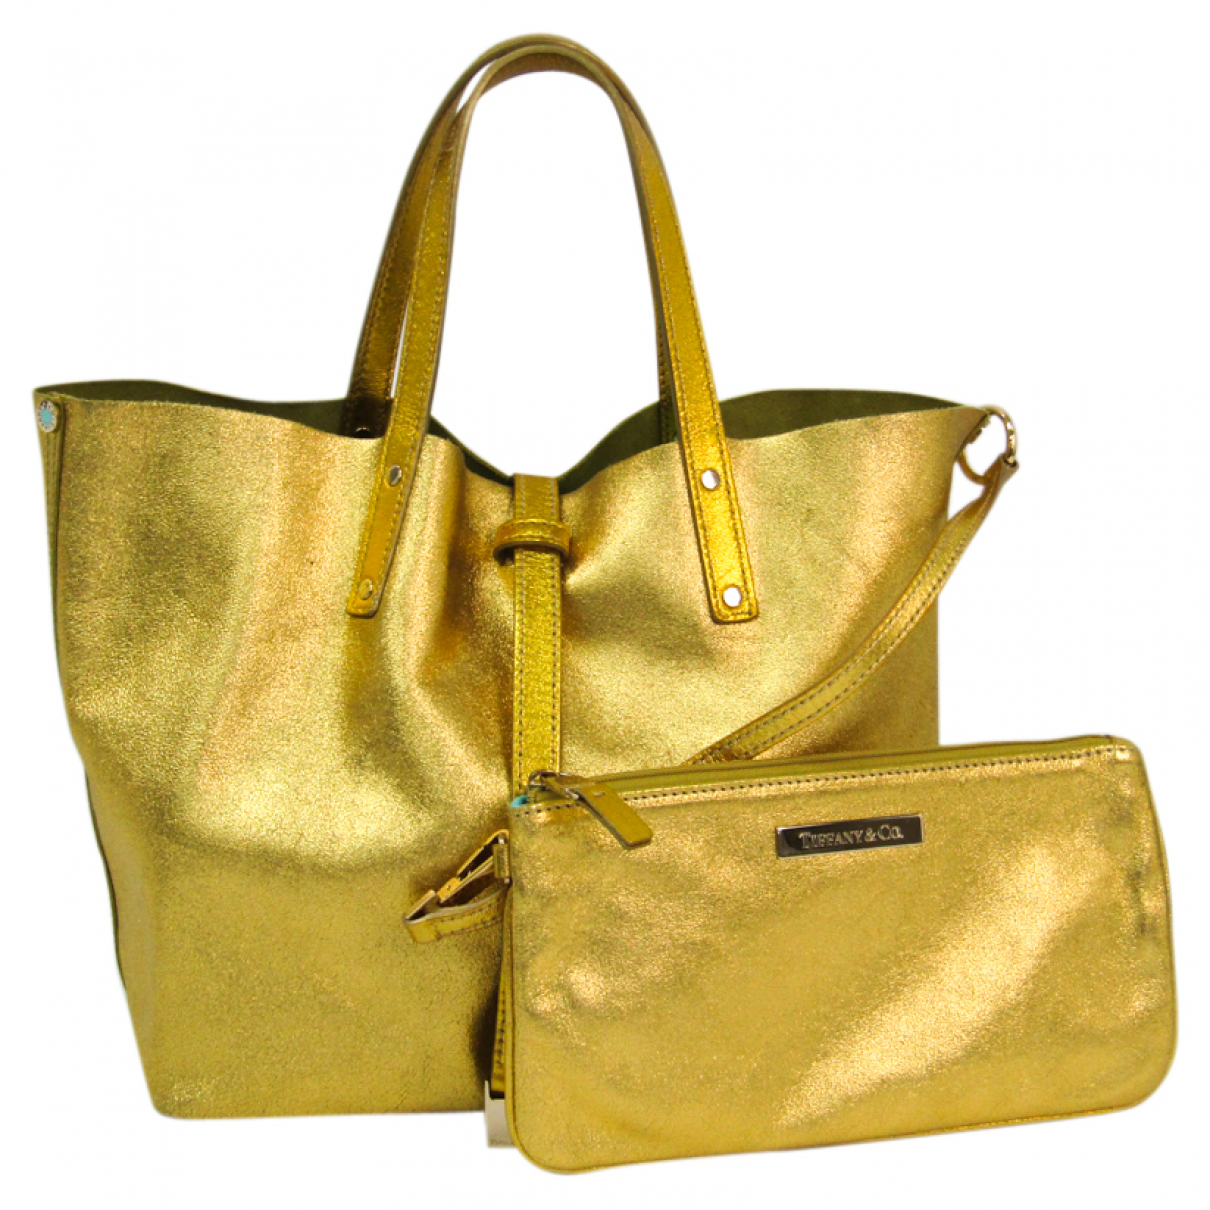 Tiffany & Co \N Handtasche in  Gelb Leder